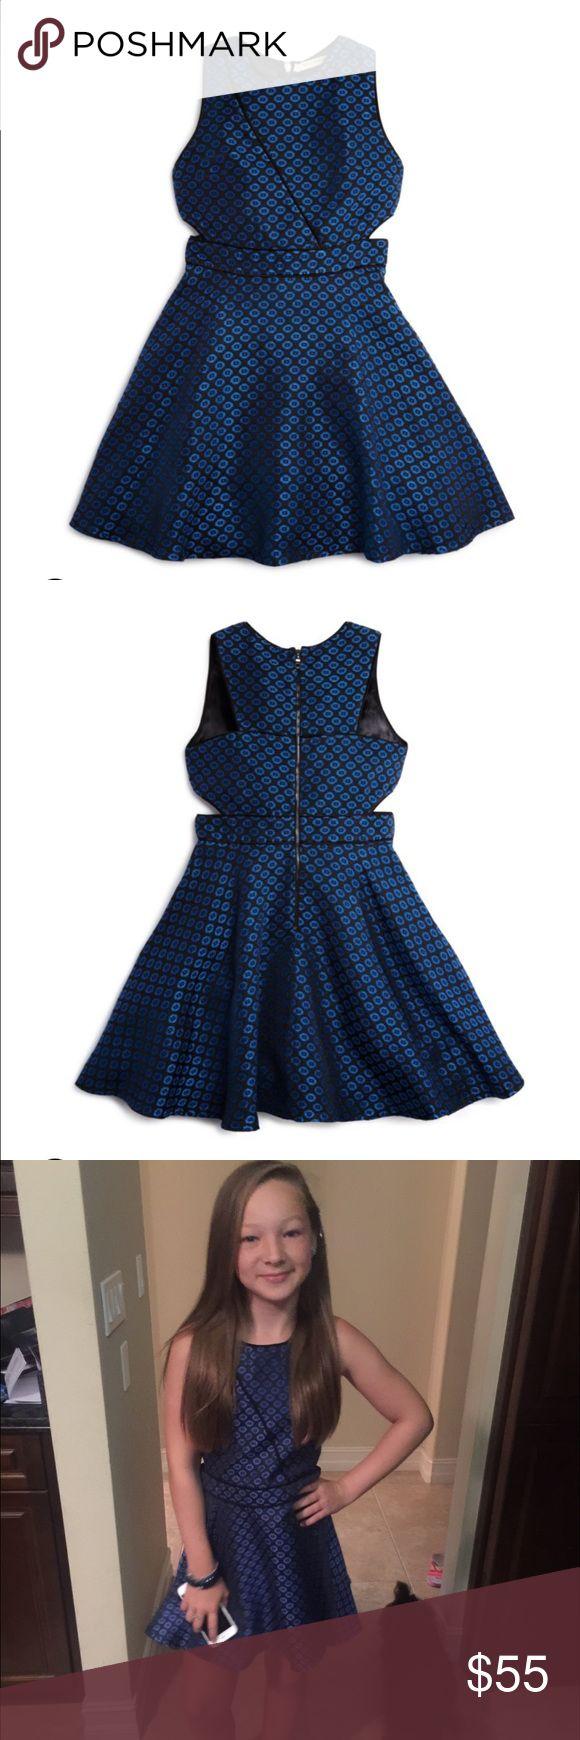 Miss Behave Girls Size L Blue And Black Dress